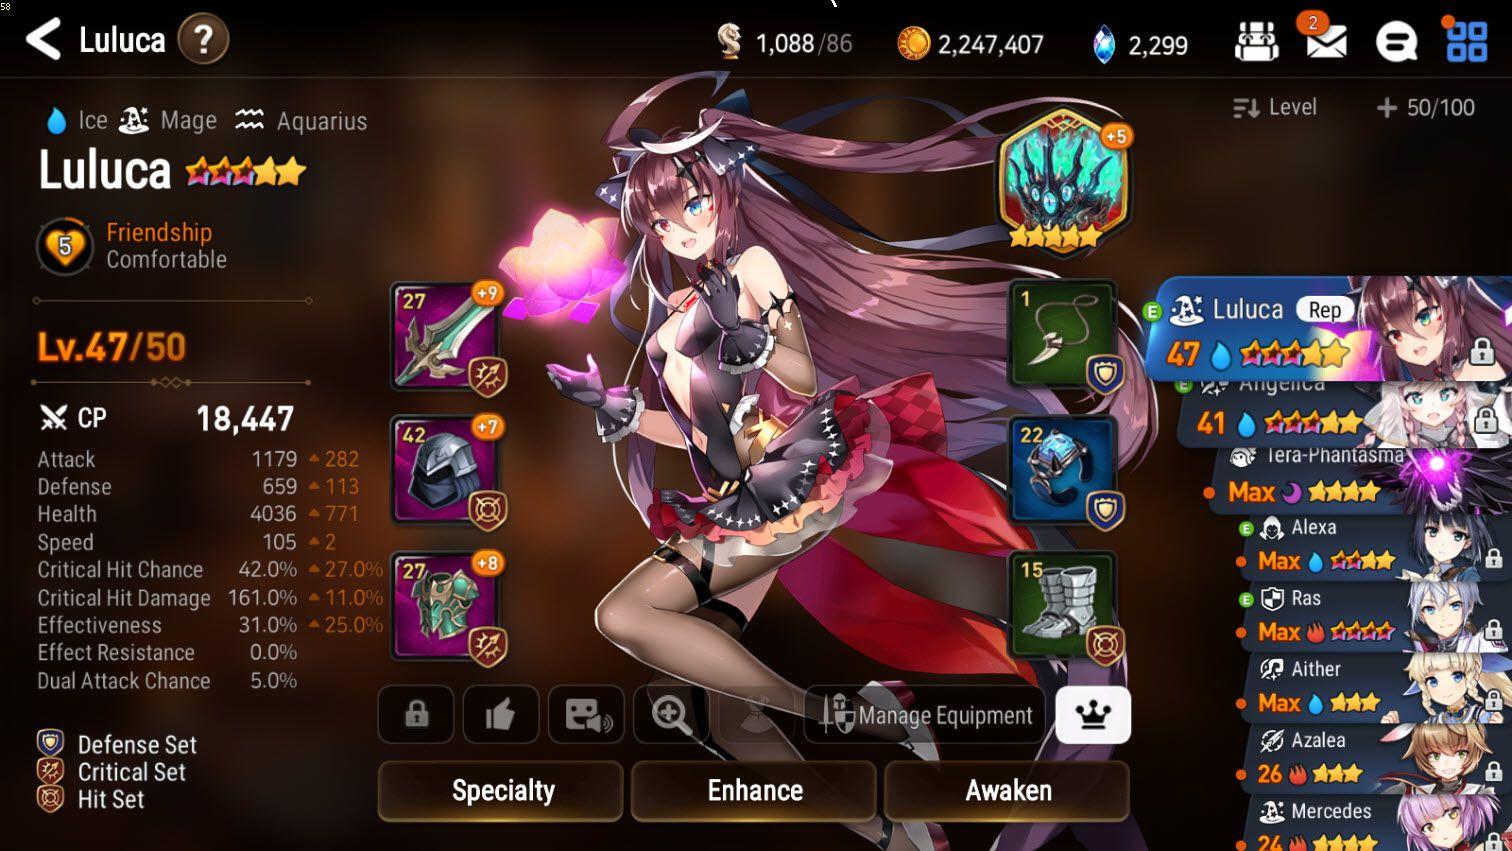 Best Of - Top 13 Hero Collector RPG / Gacha Games on iOS